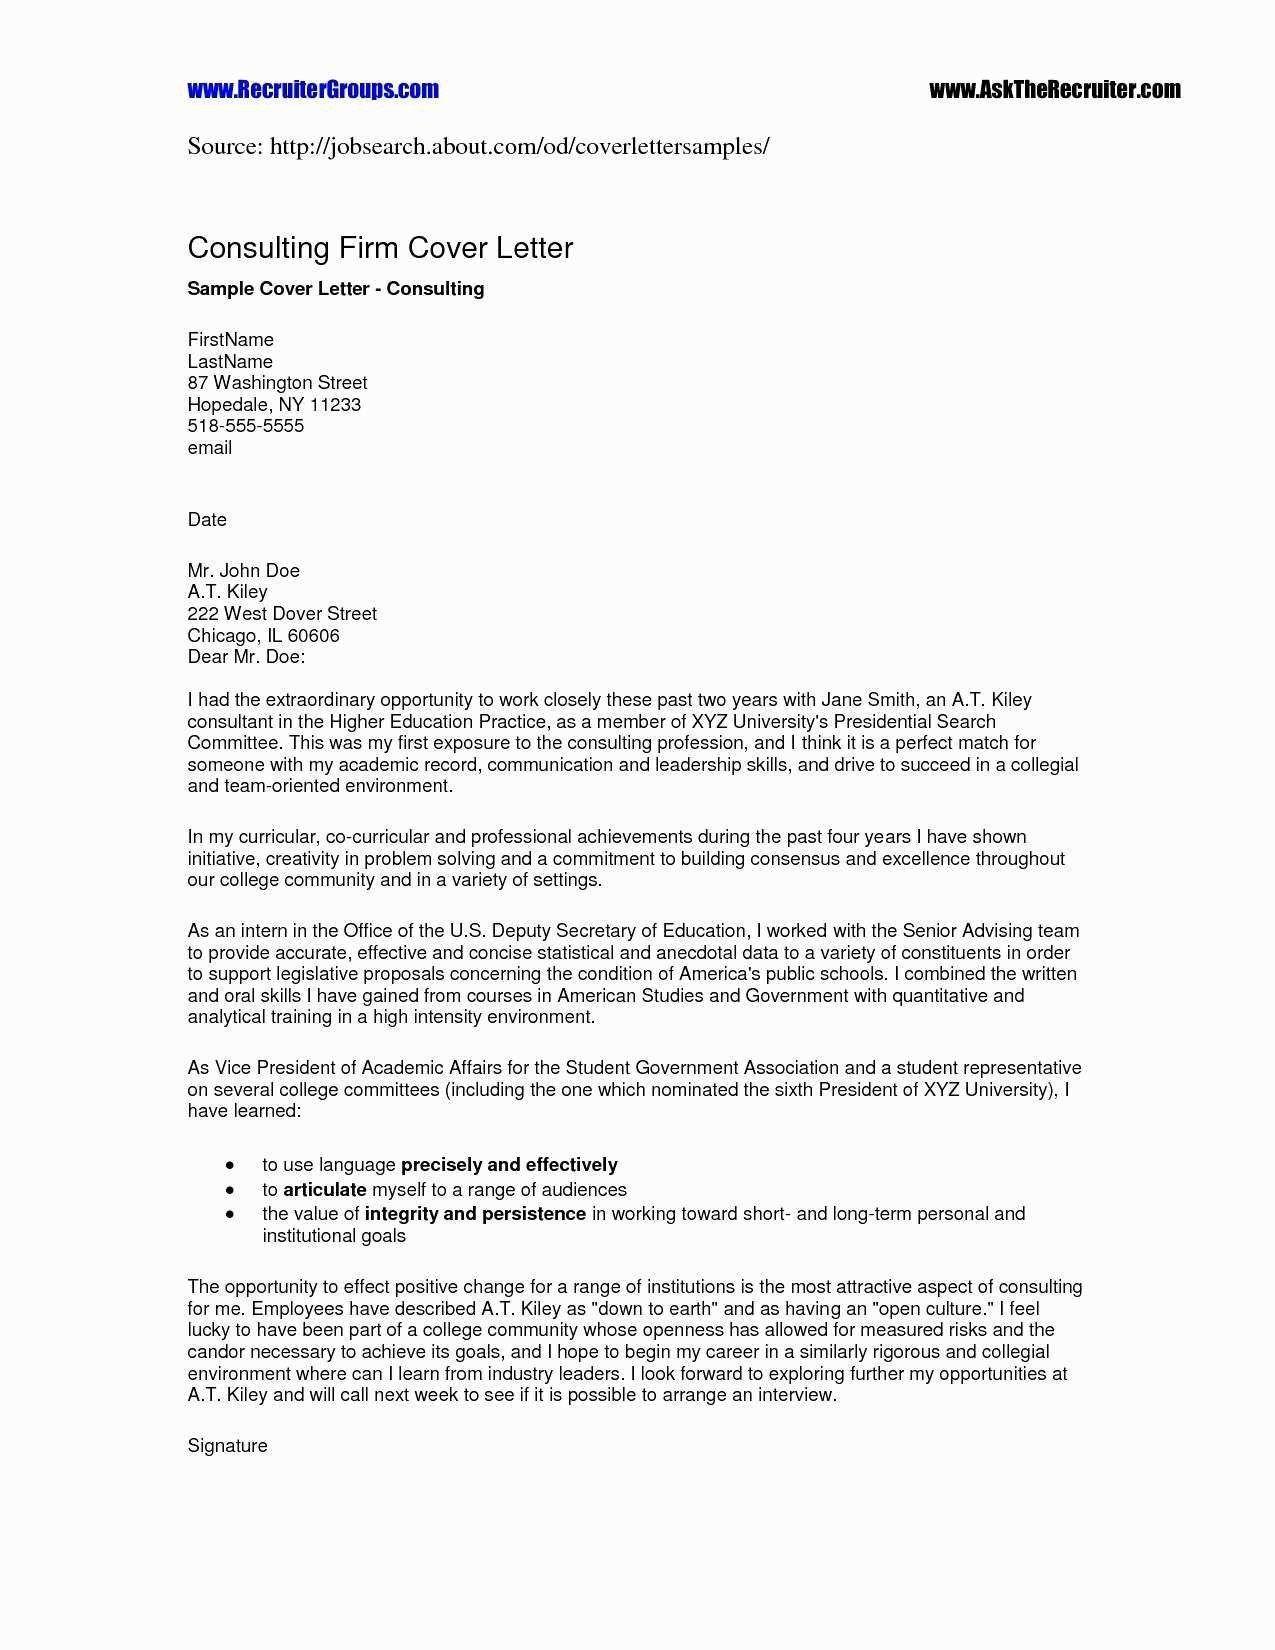 Shipping And Receiving Clerk Resume Elegant Shipping And Receiving Resume Sample 29 Shipping Clerk Resume Objective Examples Resume Skills Letter Example Resume for shipping and receiving clerk